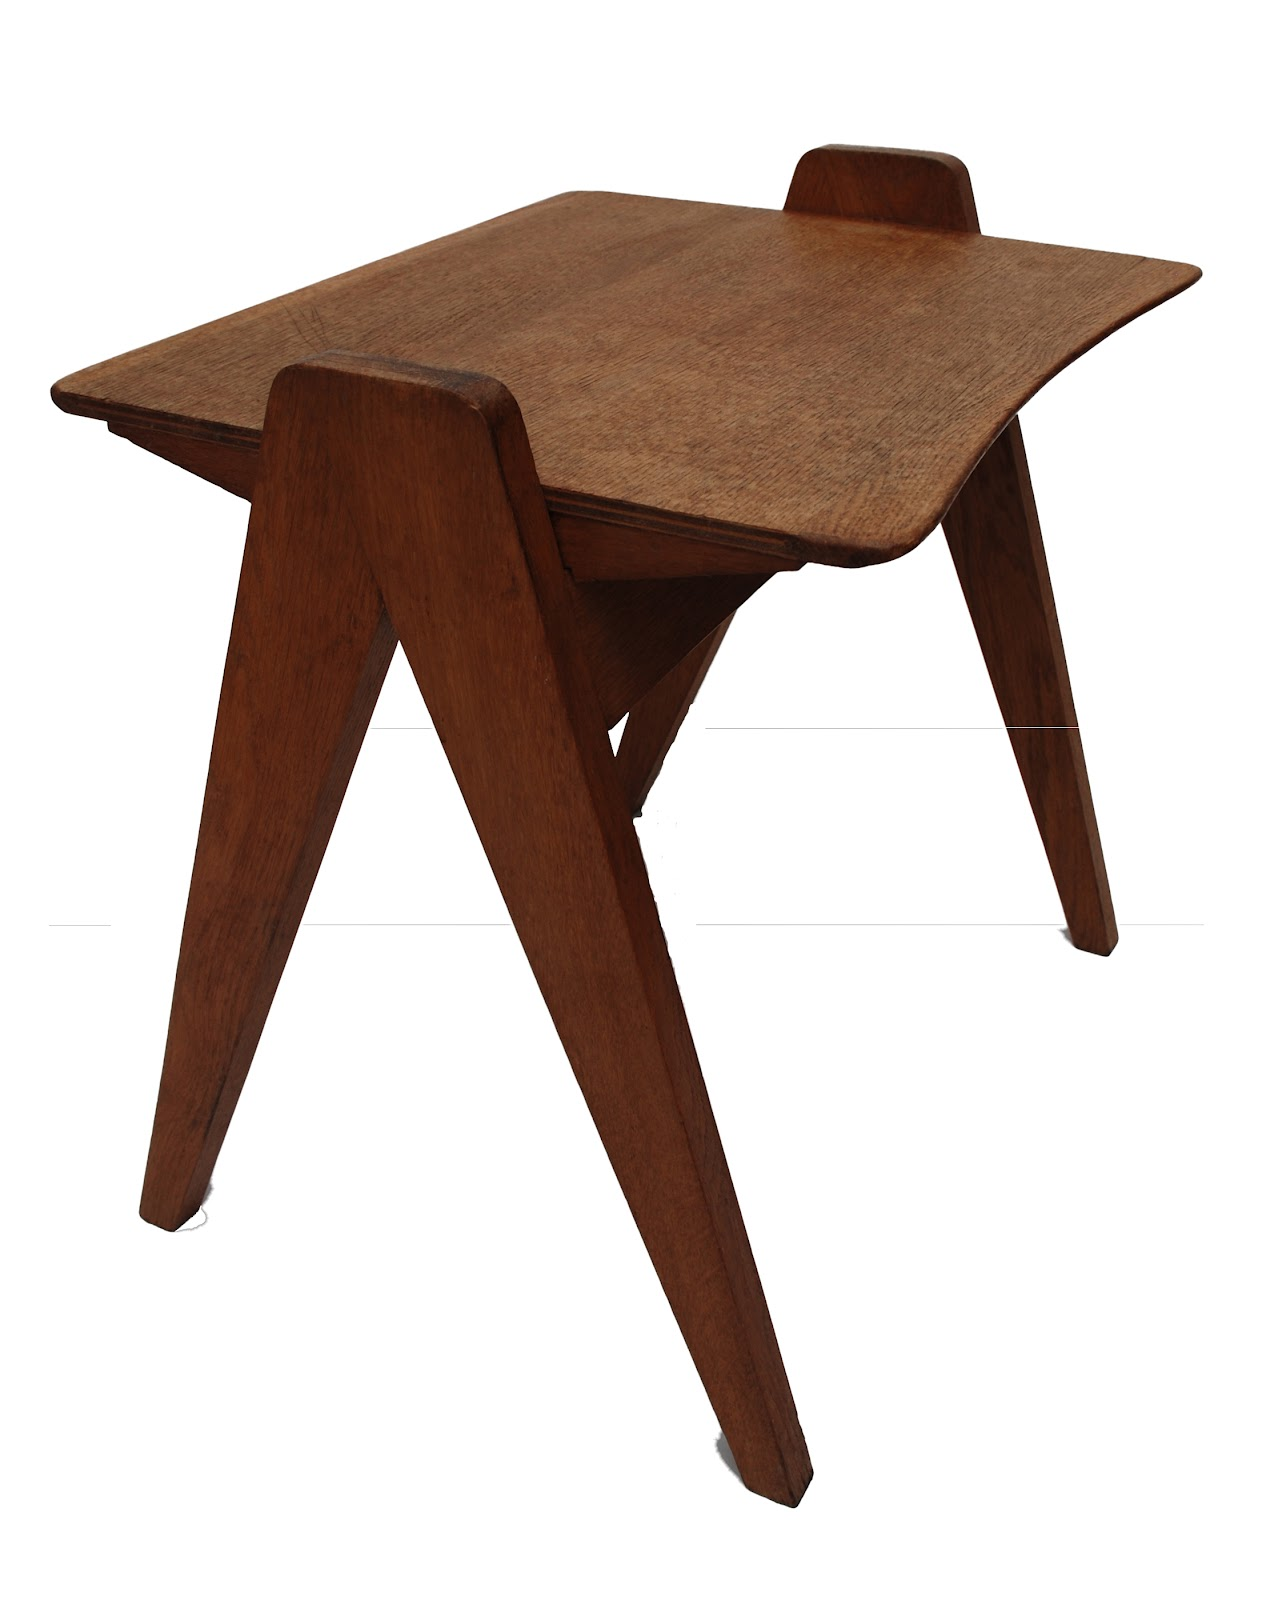 bo vintage table d 39 appoint pieds compas ann es 50. Black Bedroom Furniture Sets. Home Design Ideas